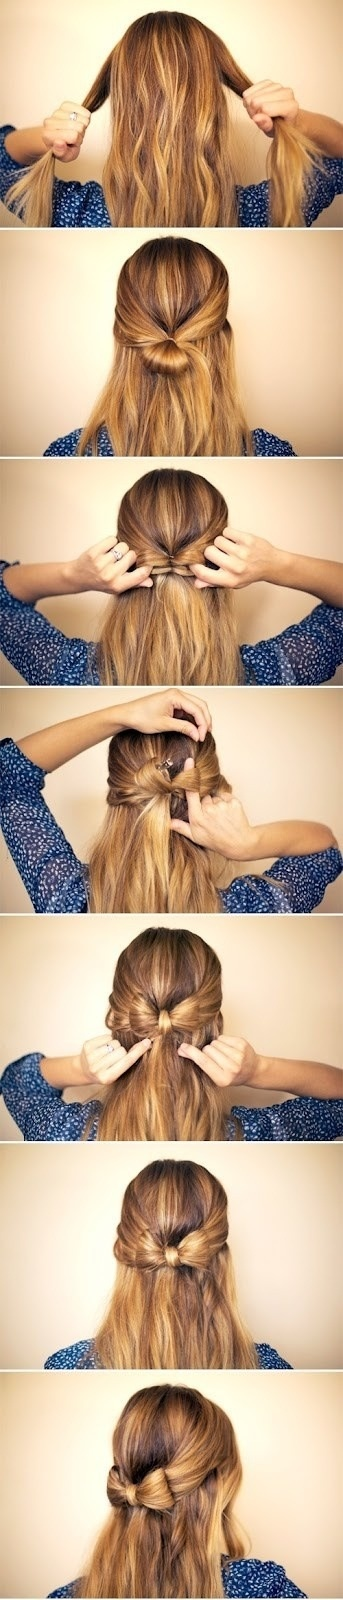 tricks :)